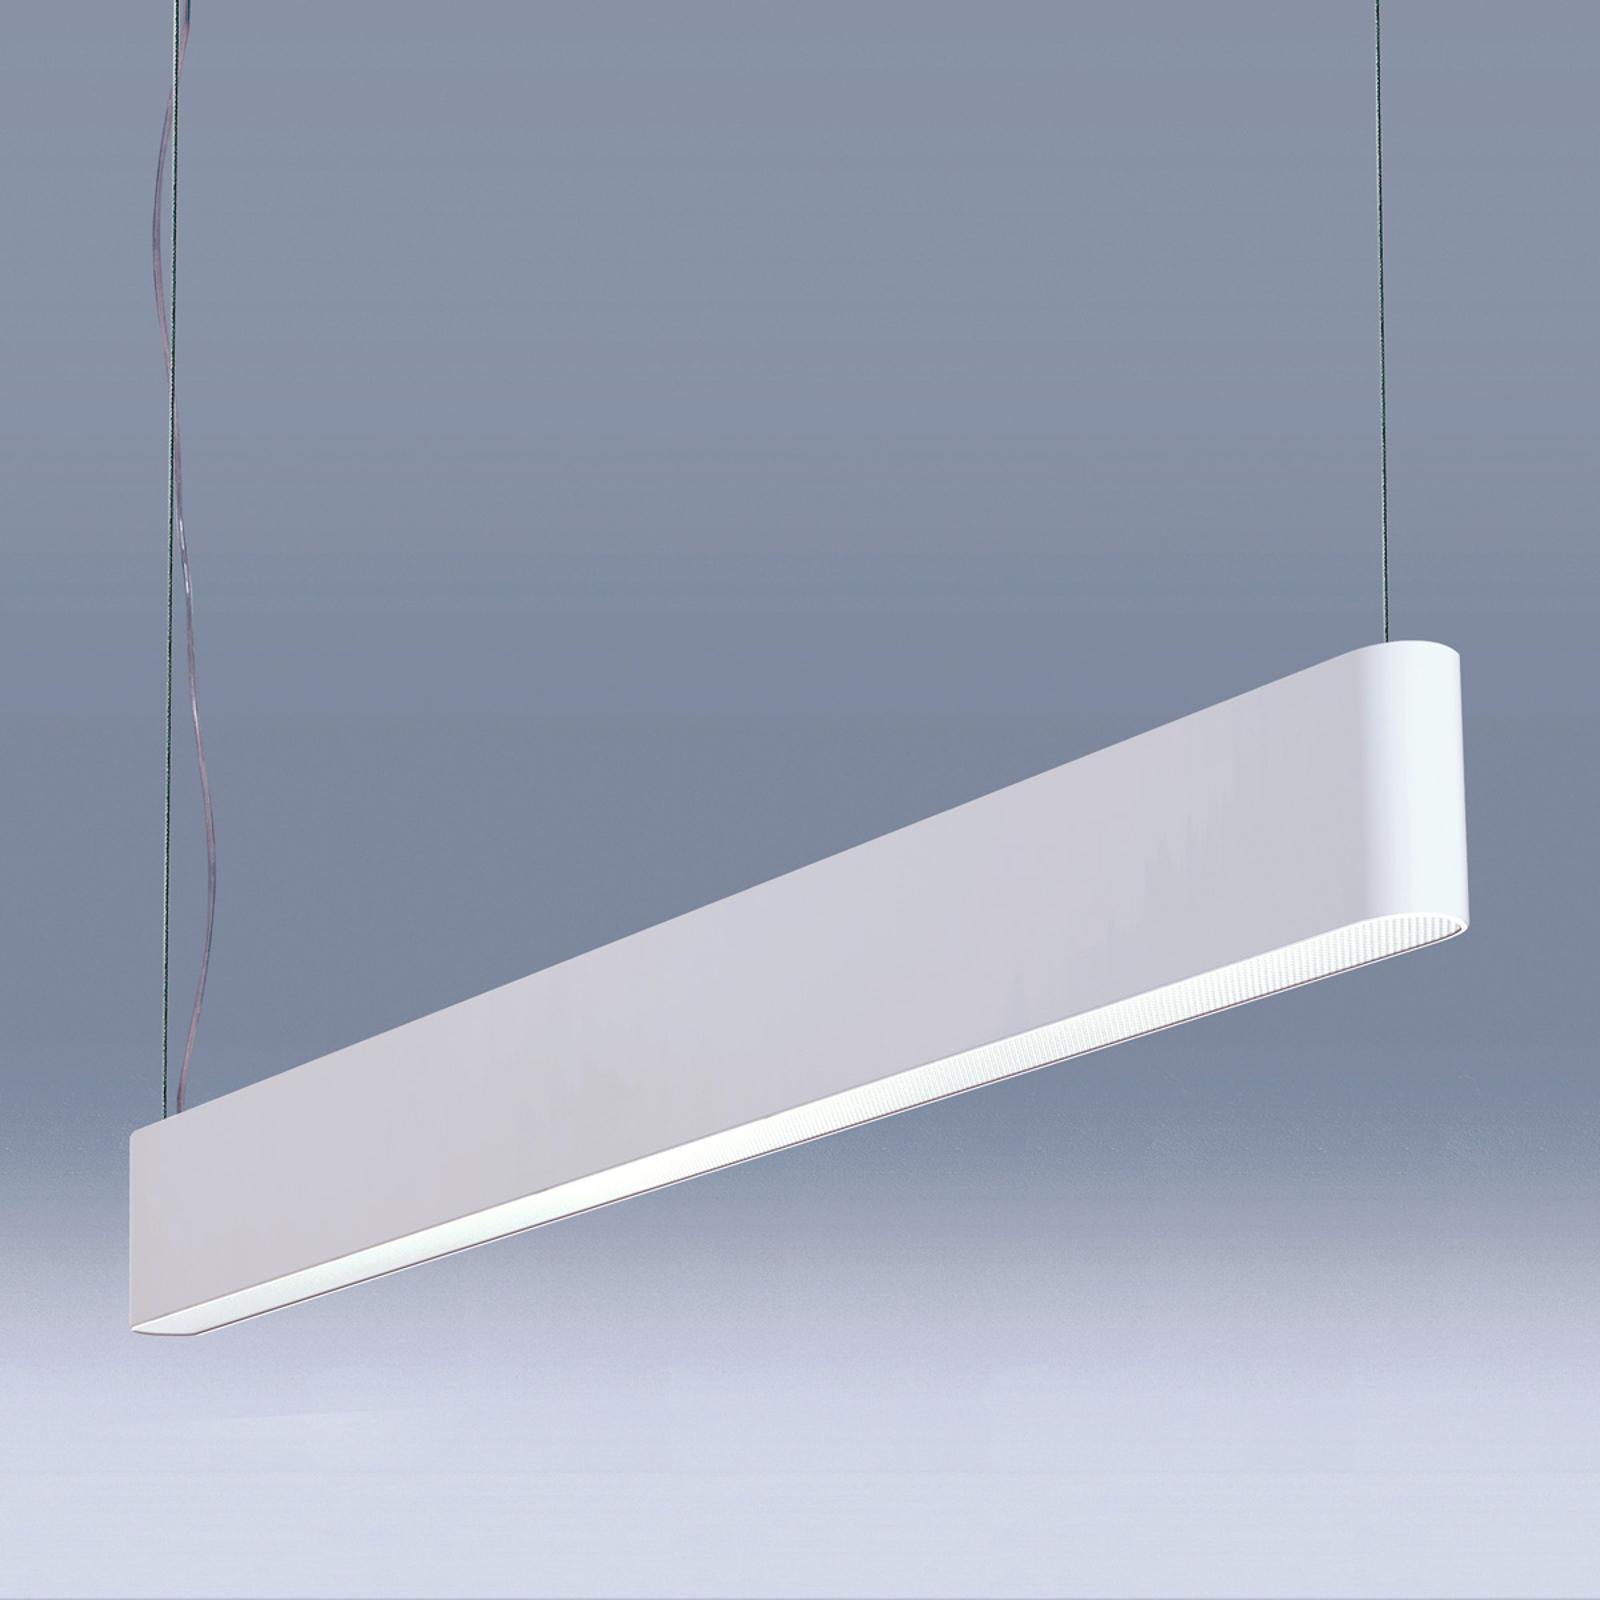 Caleo-P4 - hvit LED-hengelampe 89 cm 48 W